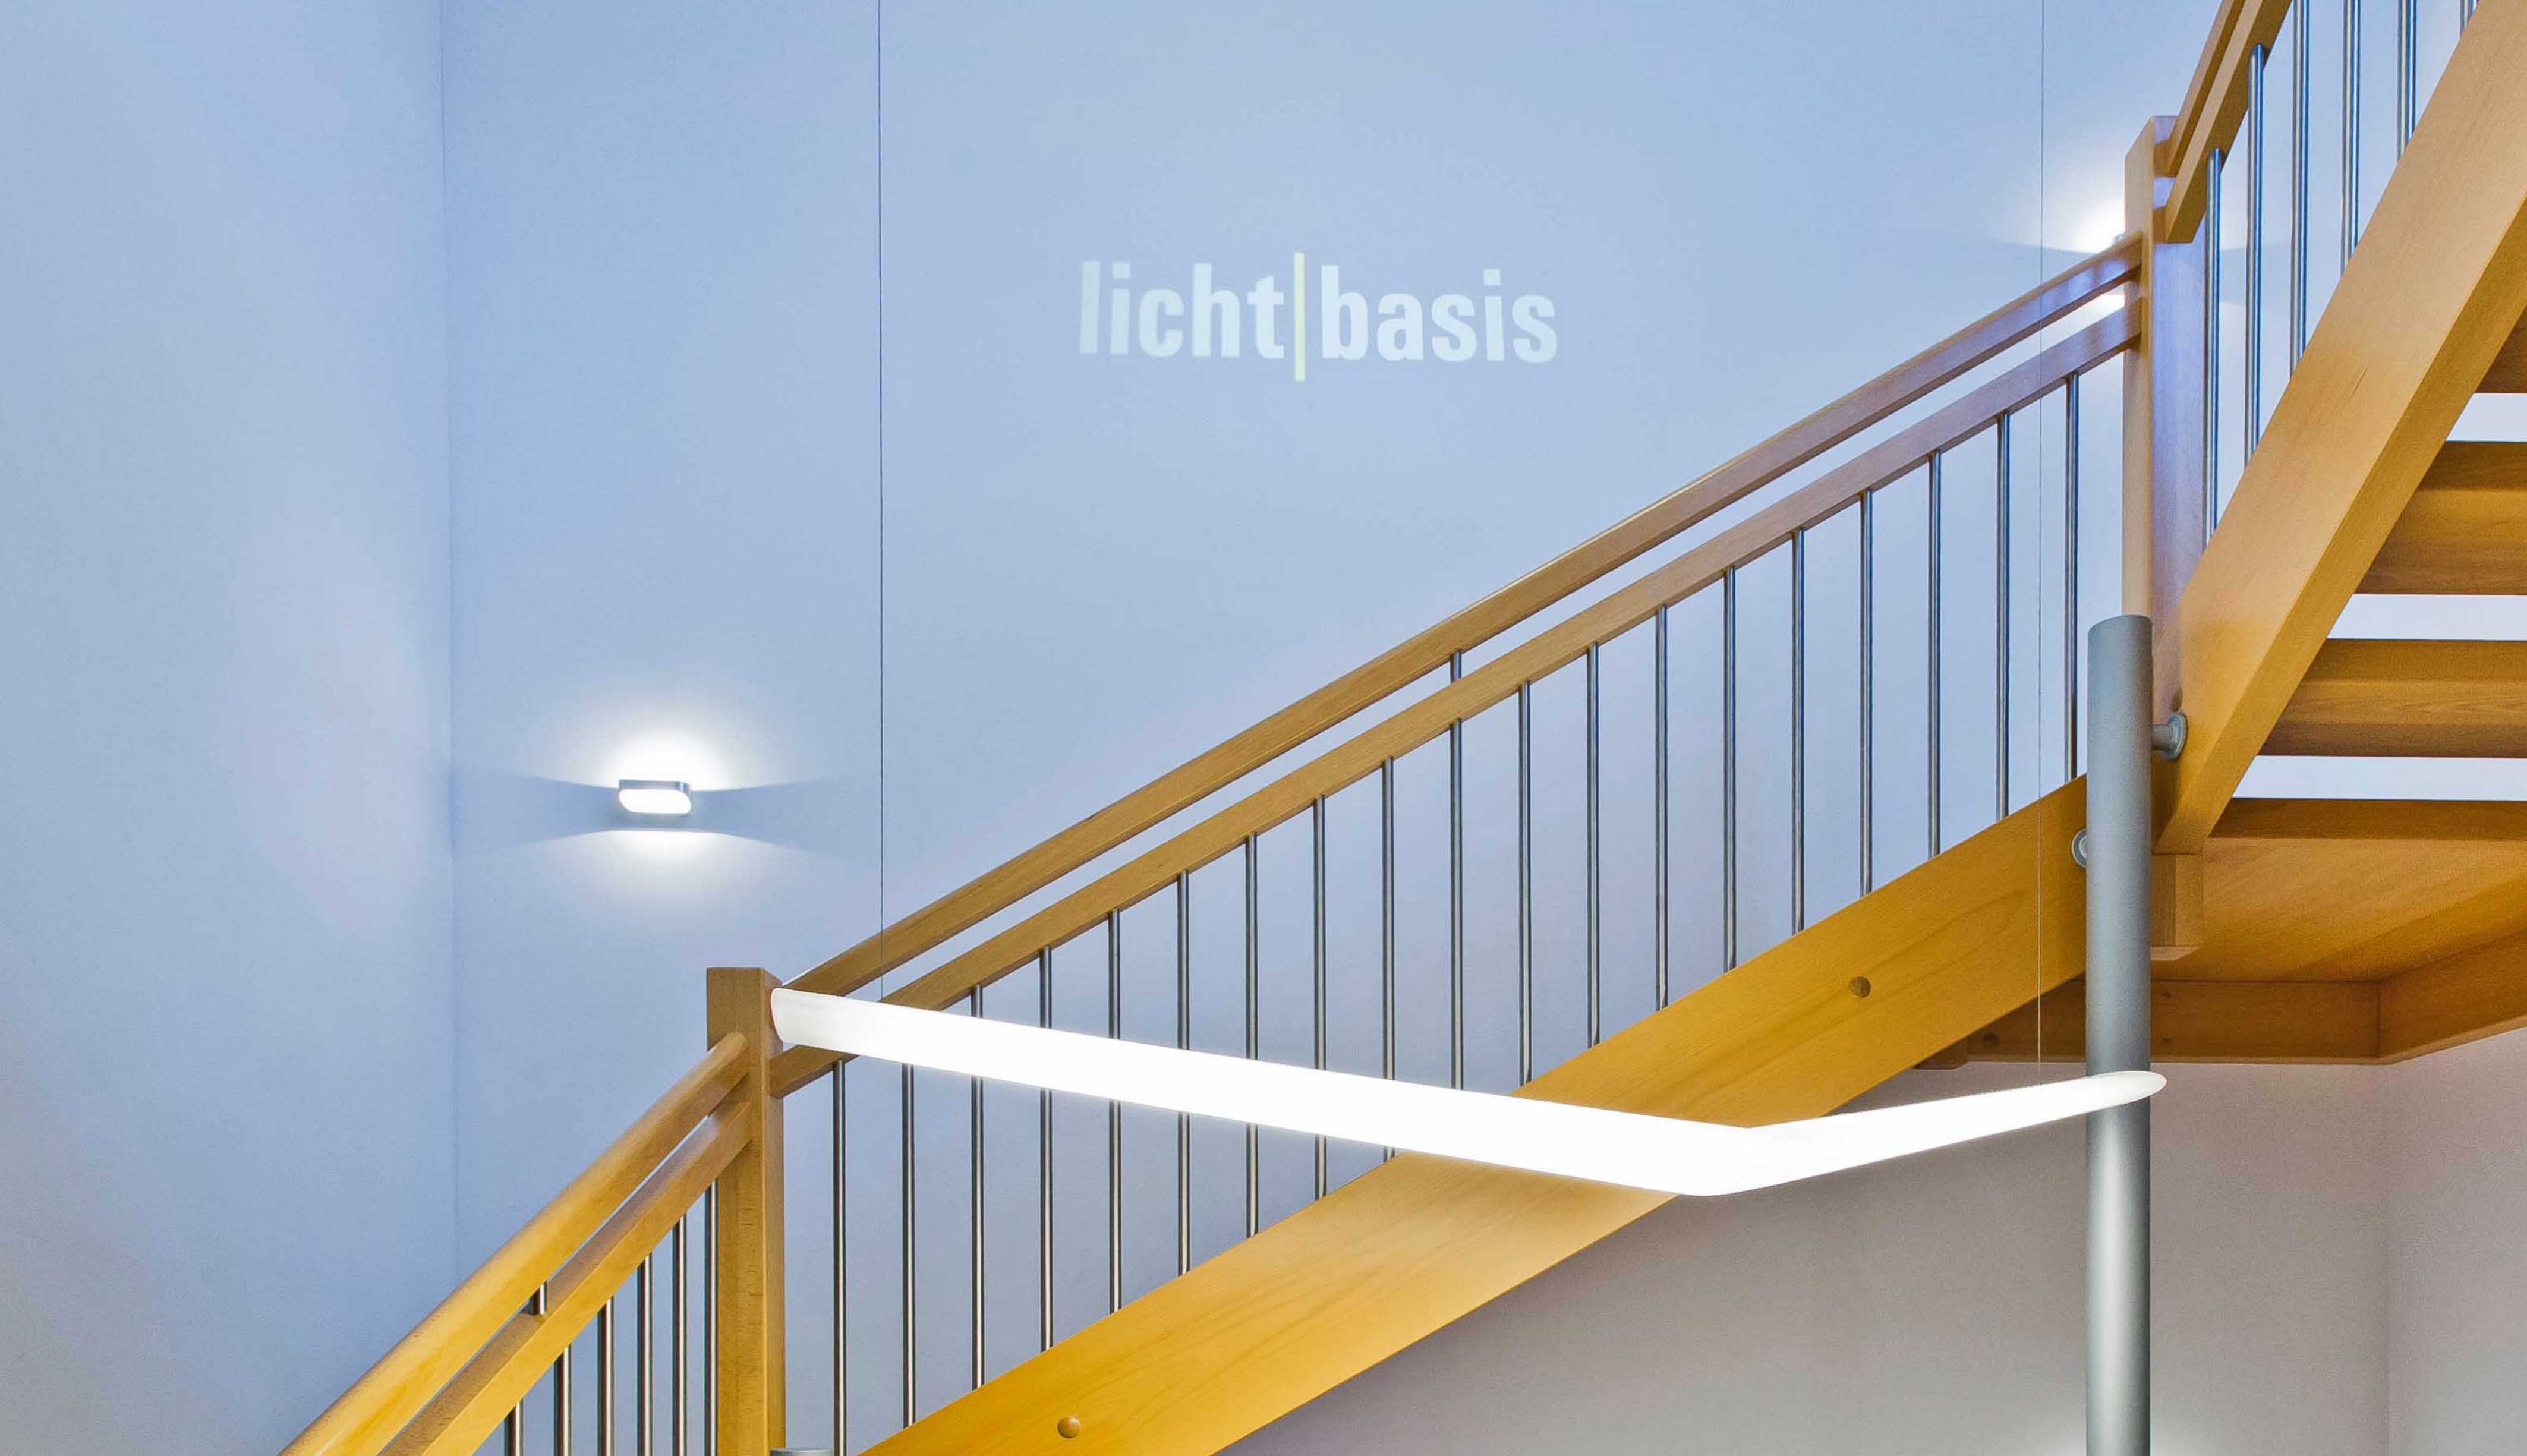 lichtbasis Firmenpräsentation